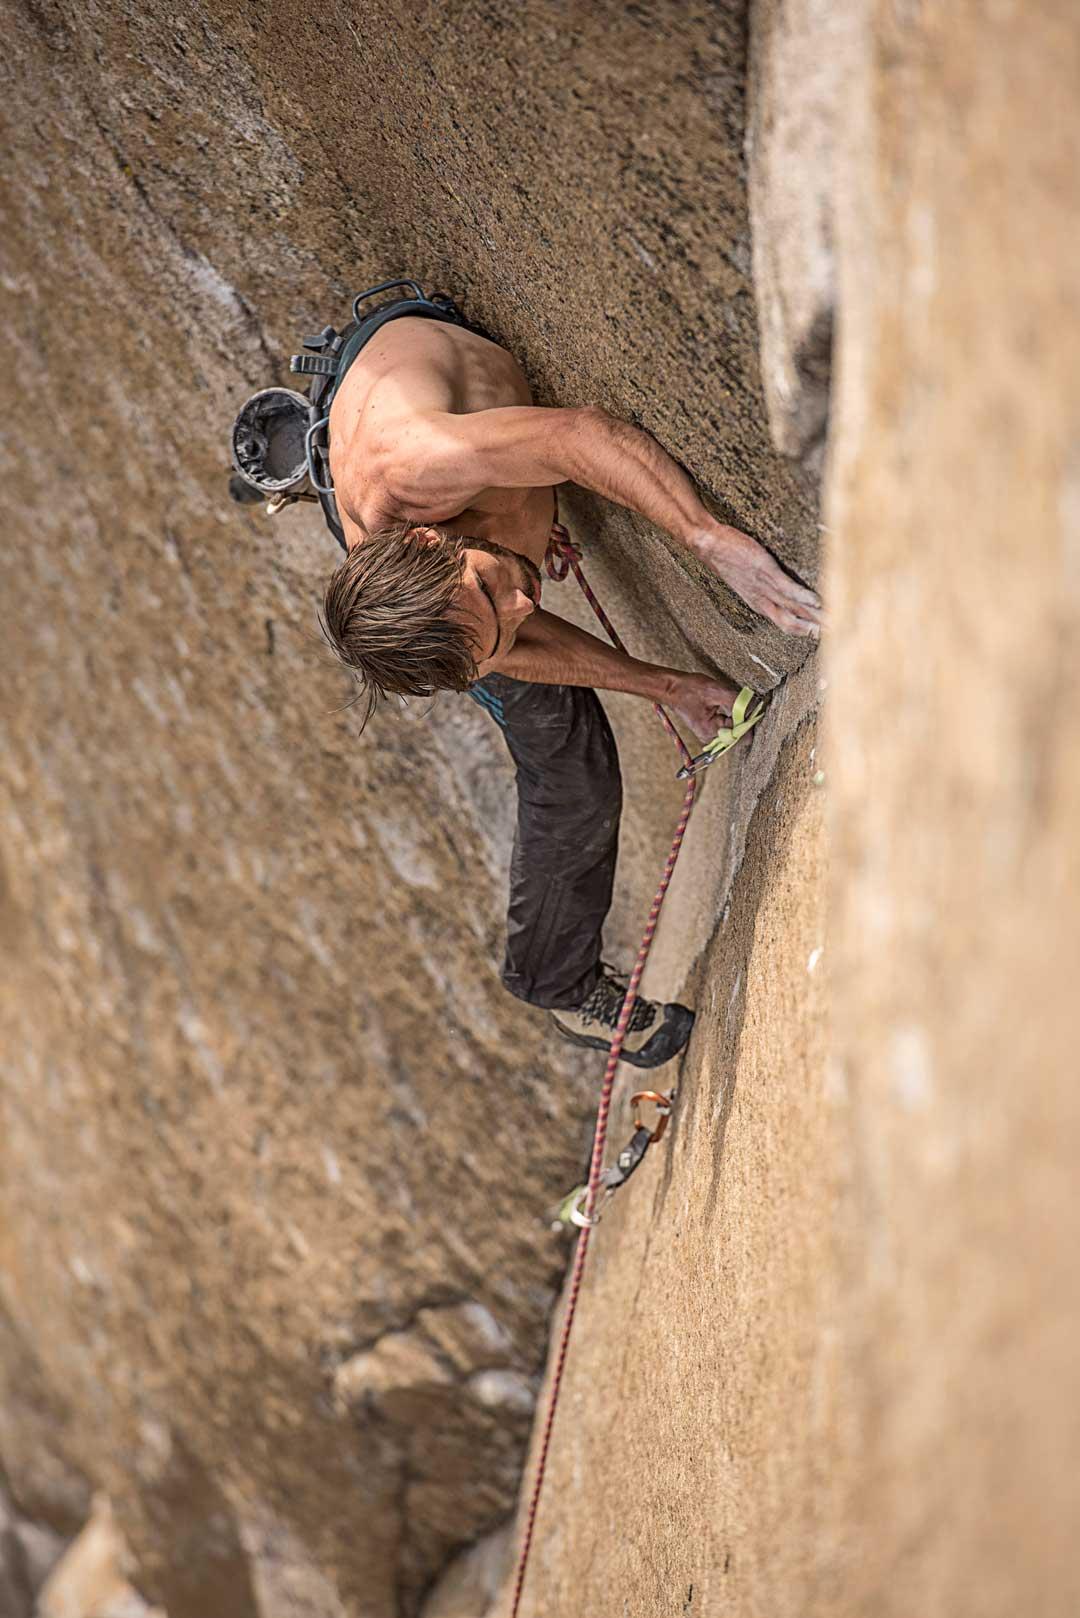 The-Climb-of-a-Lifetime2